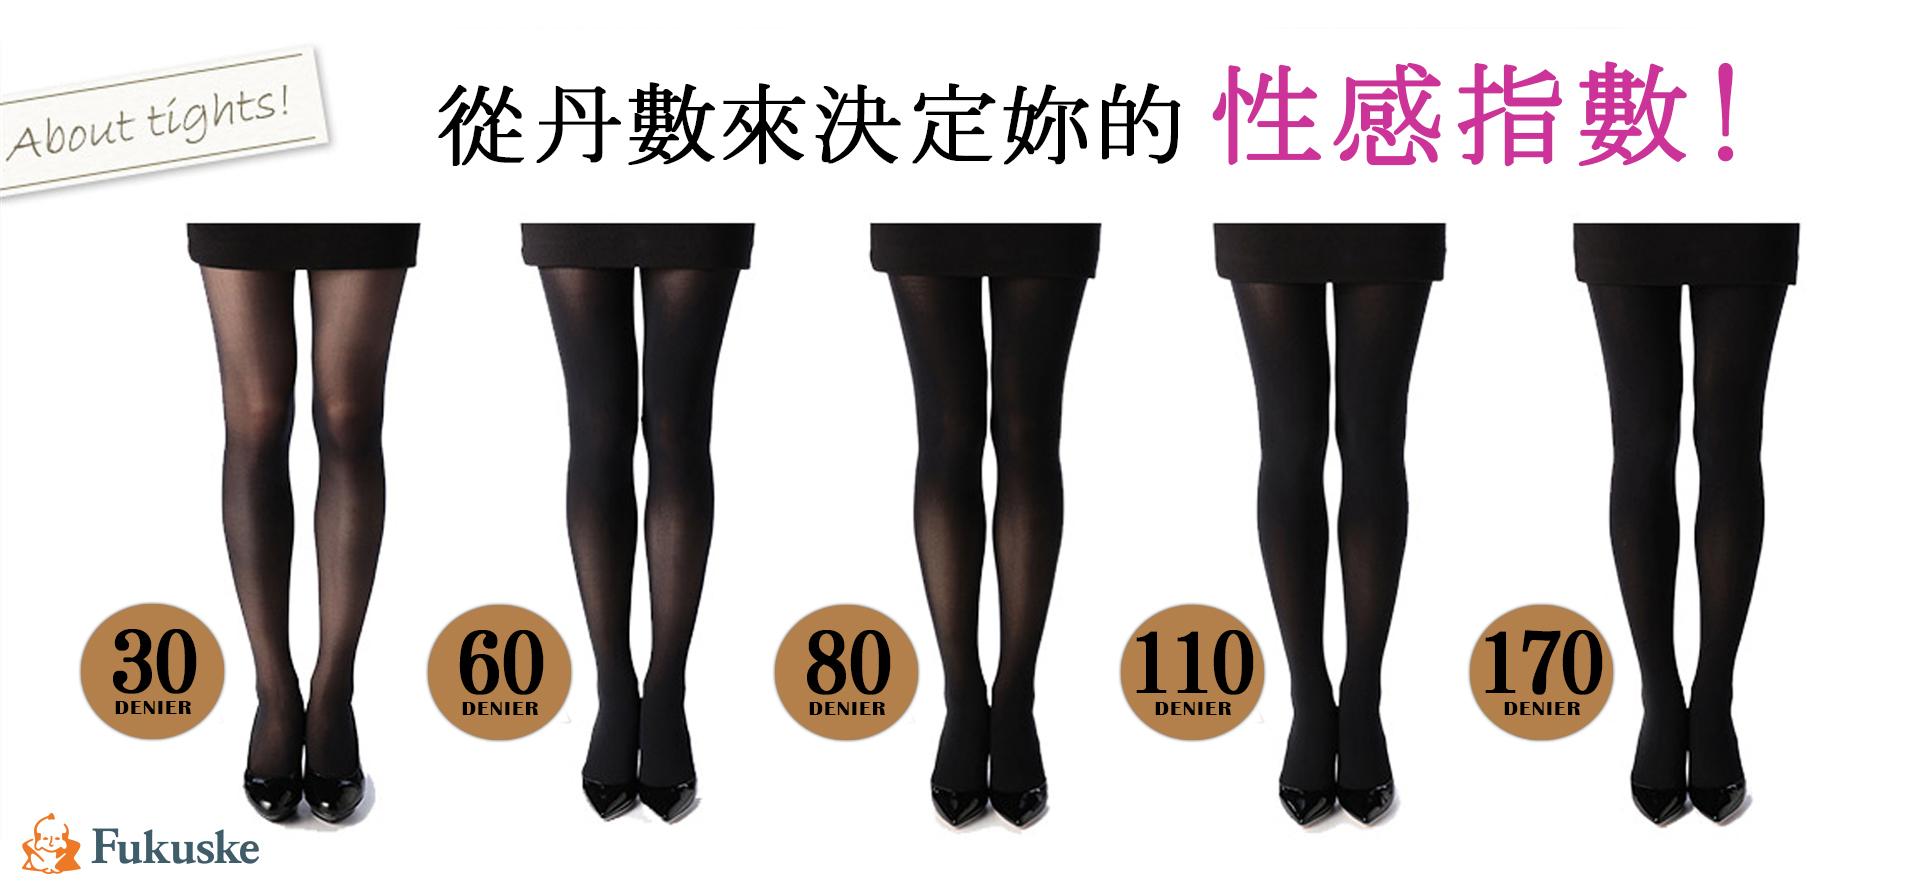 日本滿足Fukuske冬天保暖褲襪